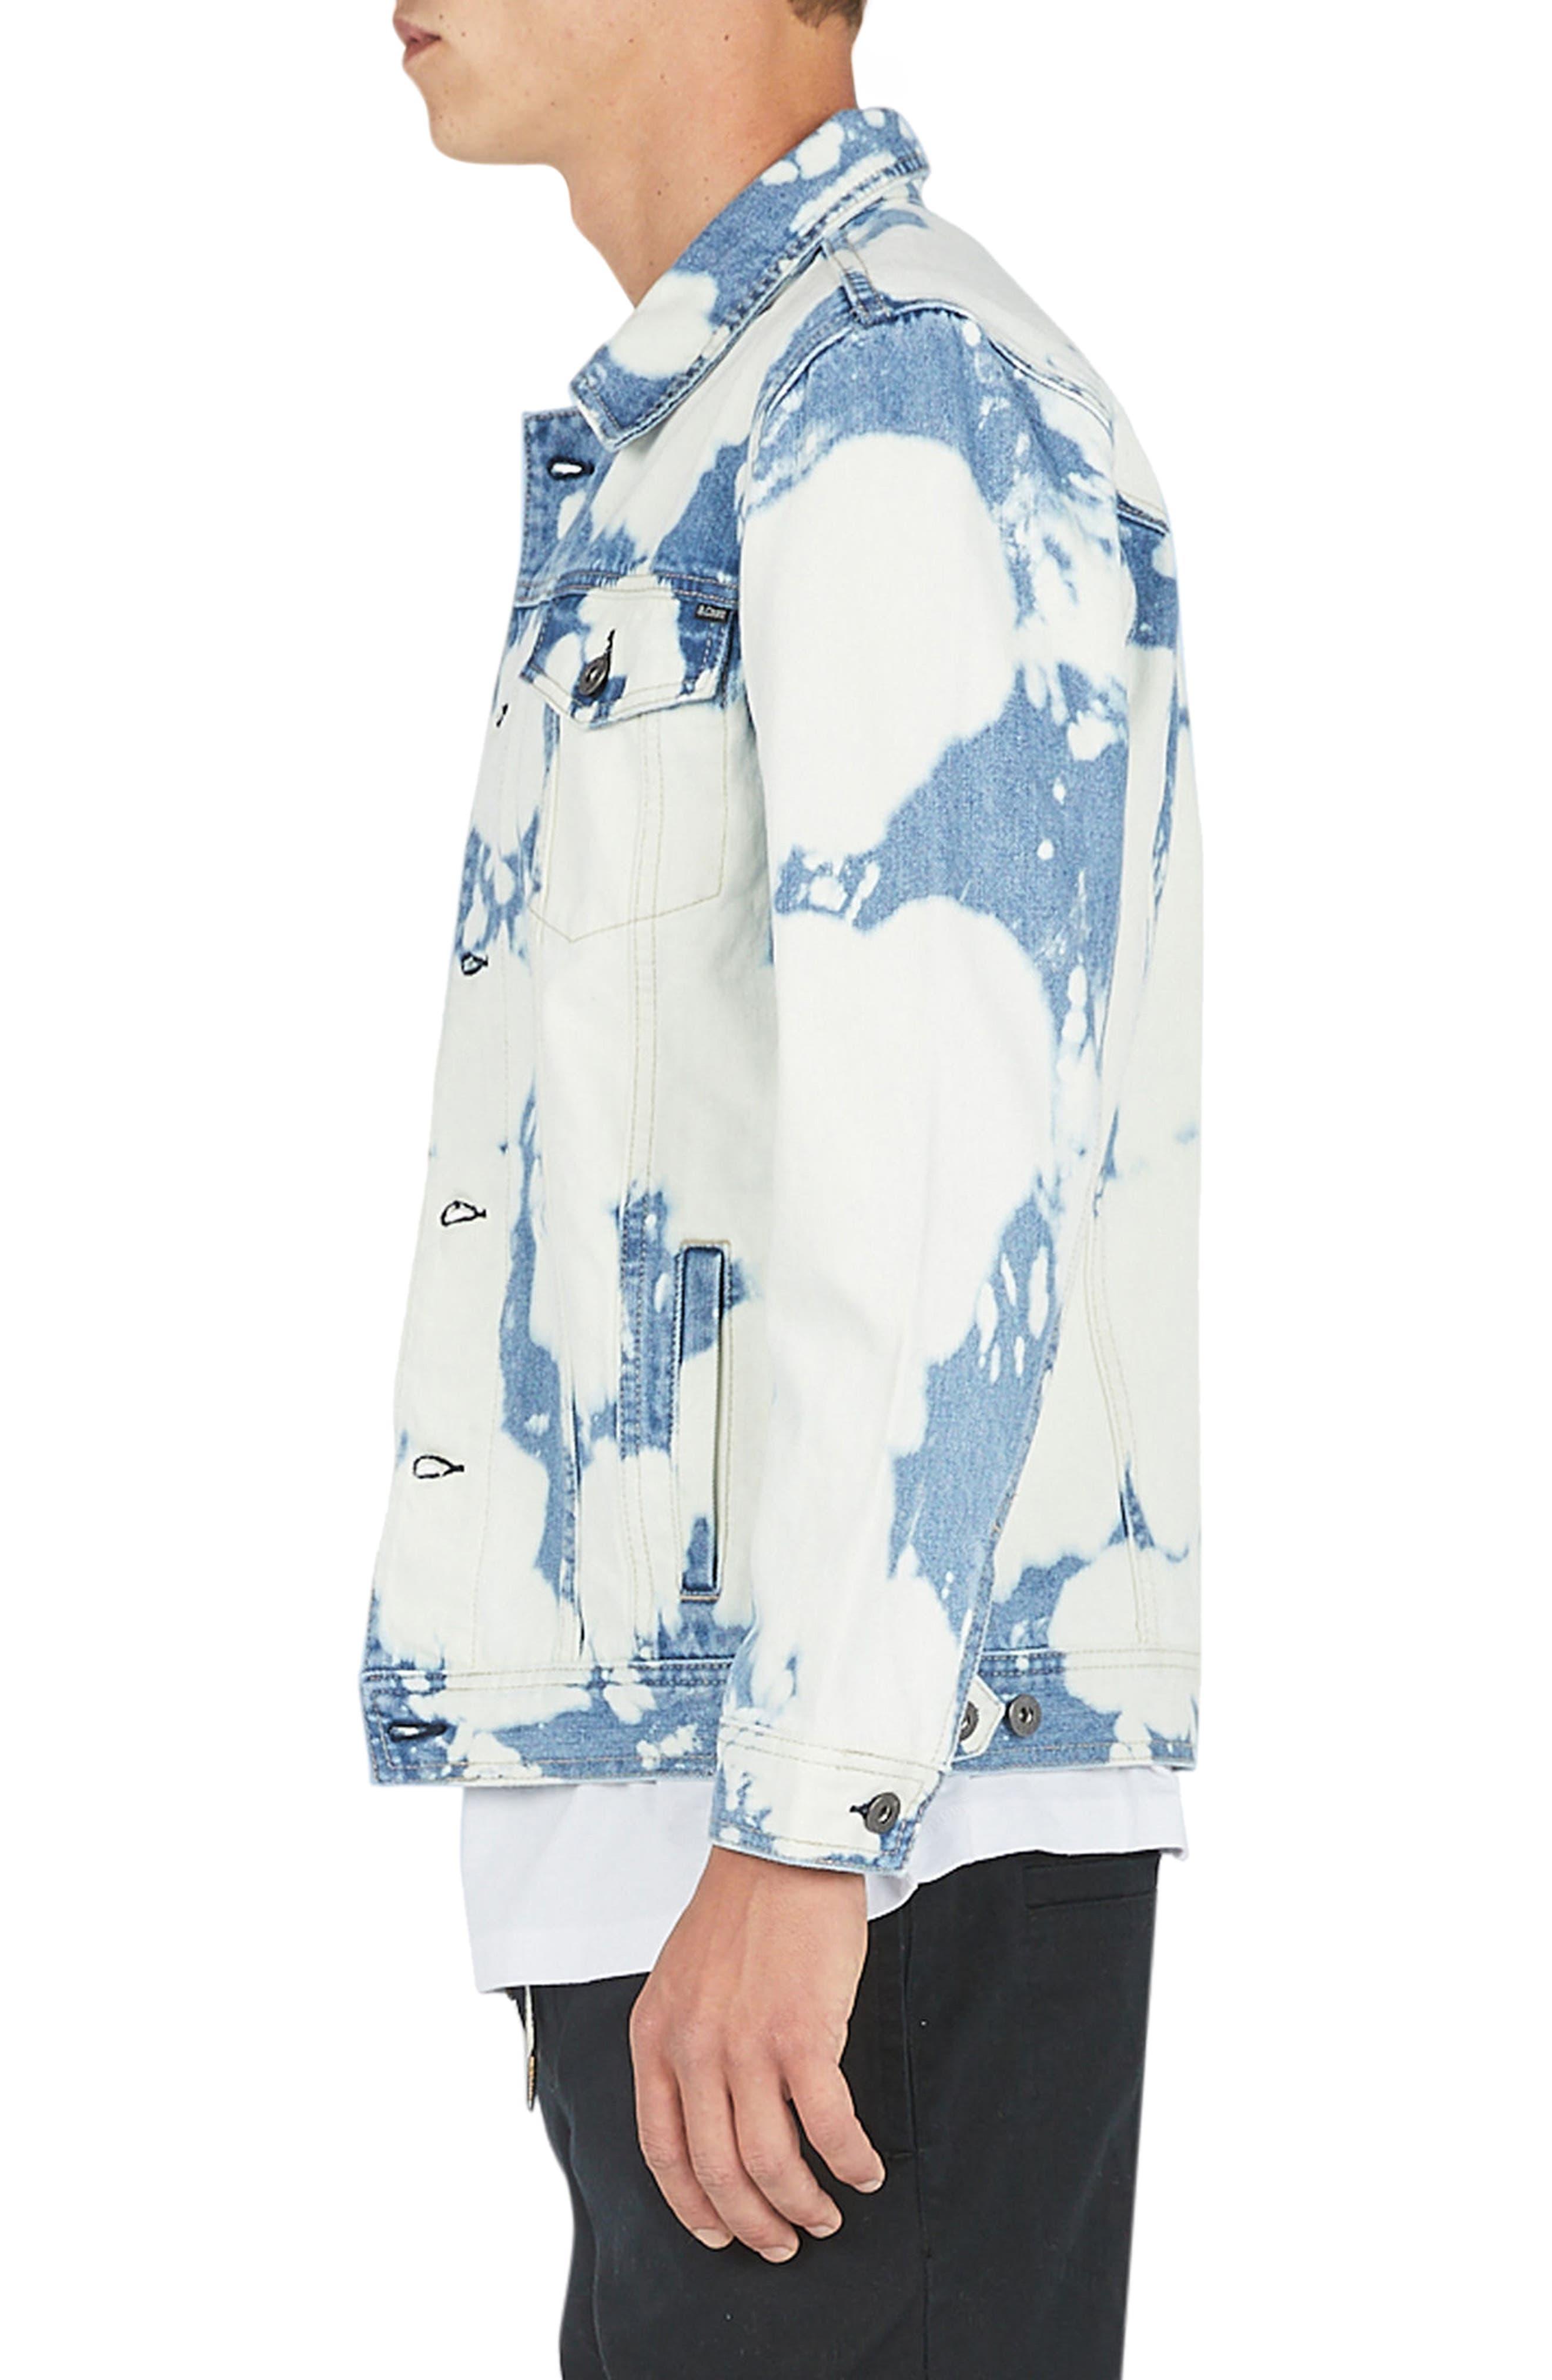 B. Rigid Denim Jacket,                             Alternate thumbnail 3, color,                             Bleached Blue